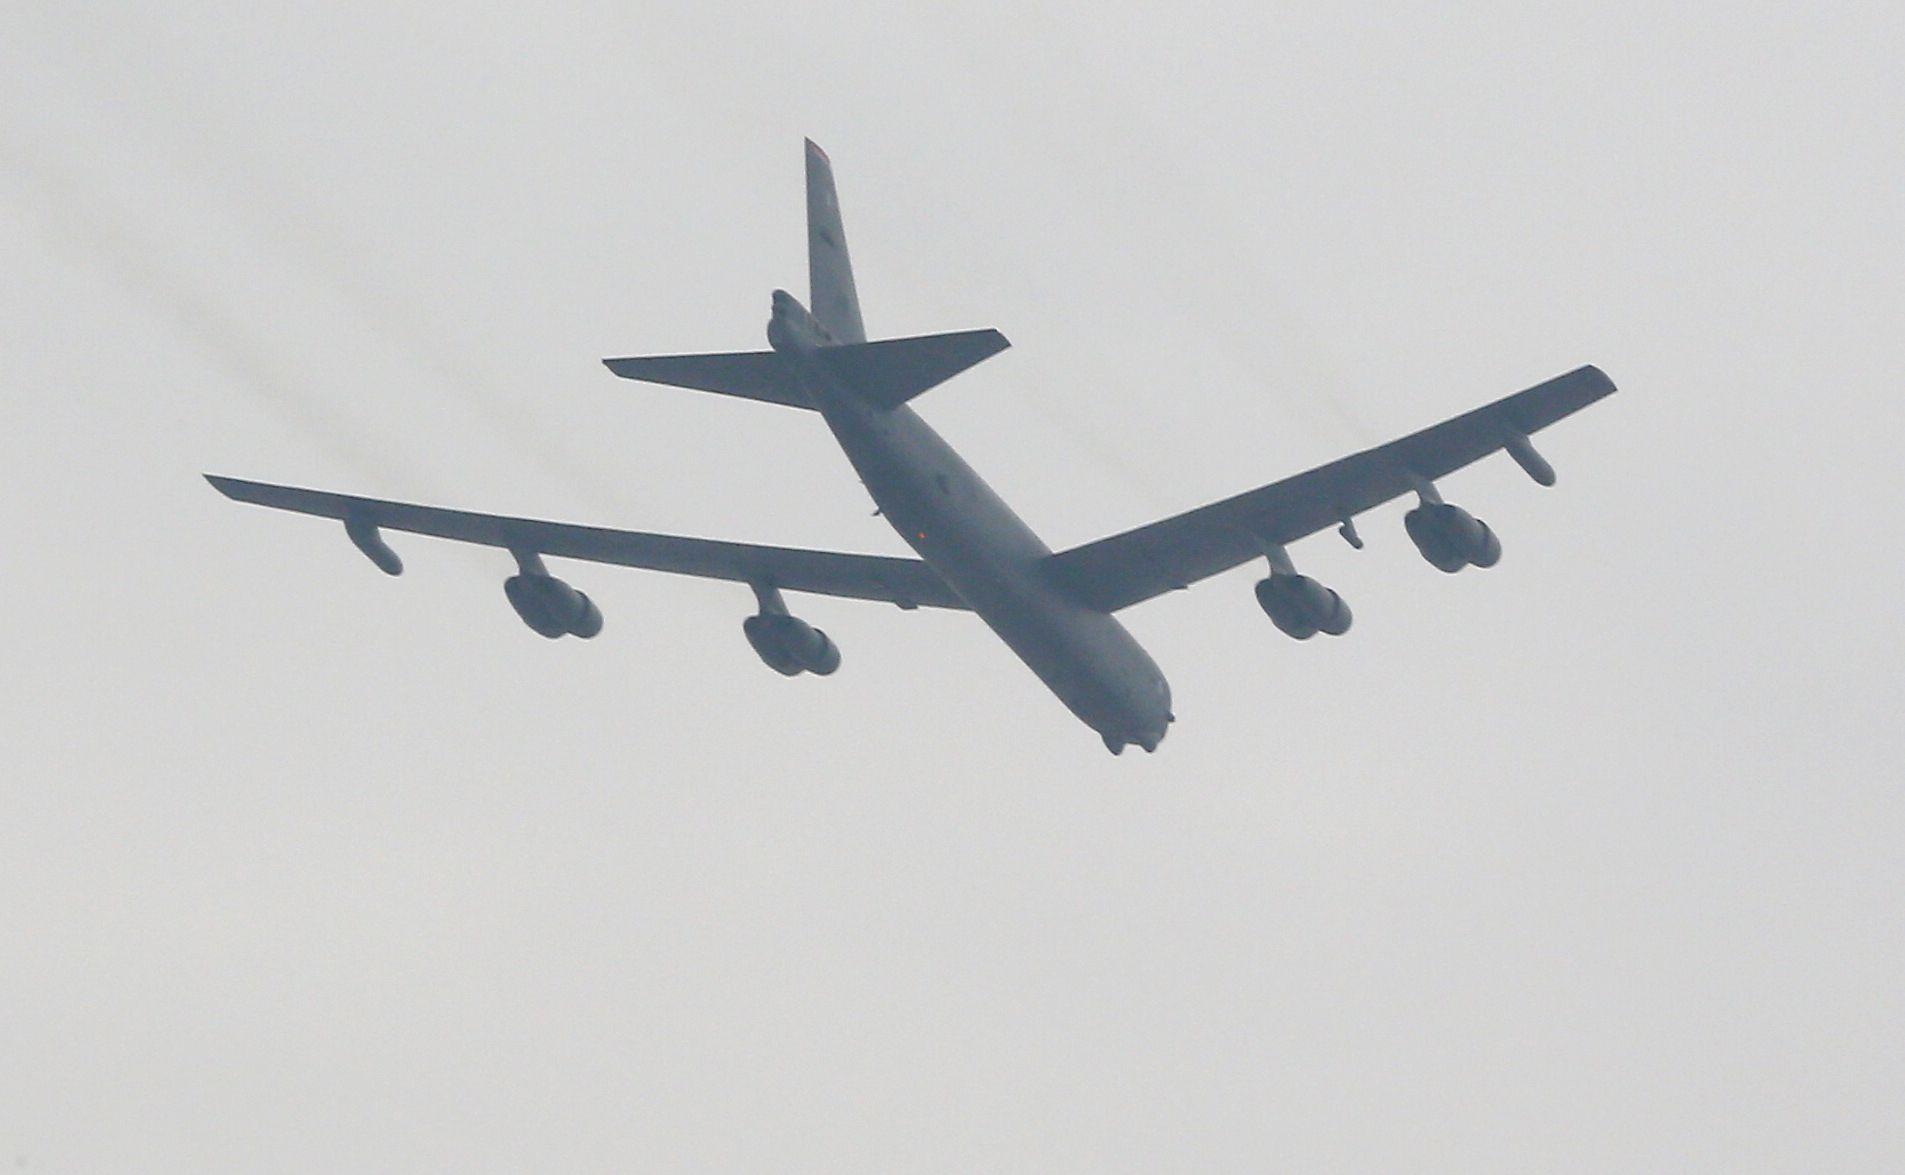 01_17_Guam_bombers